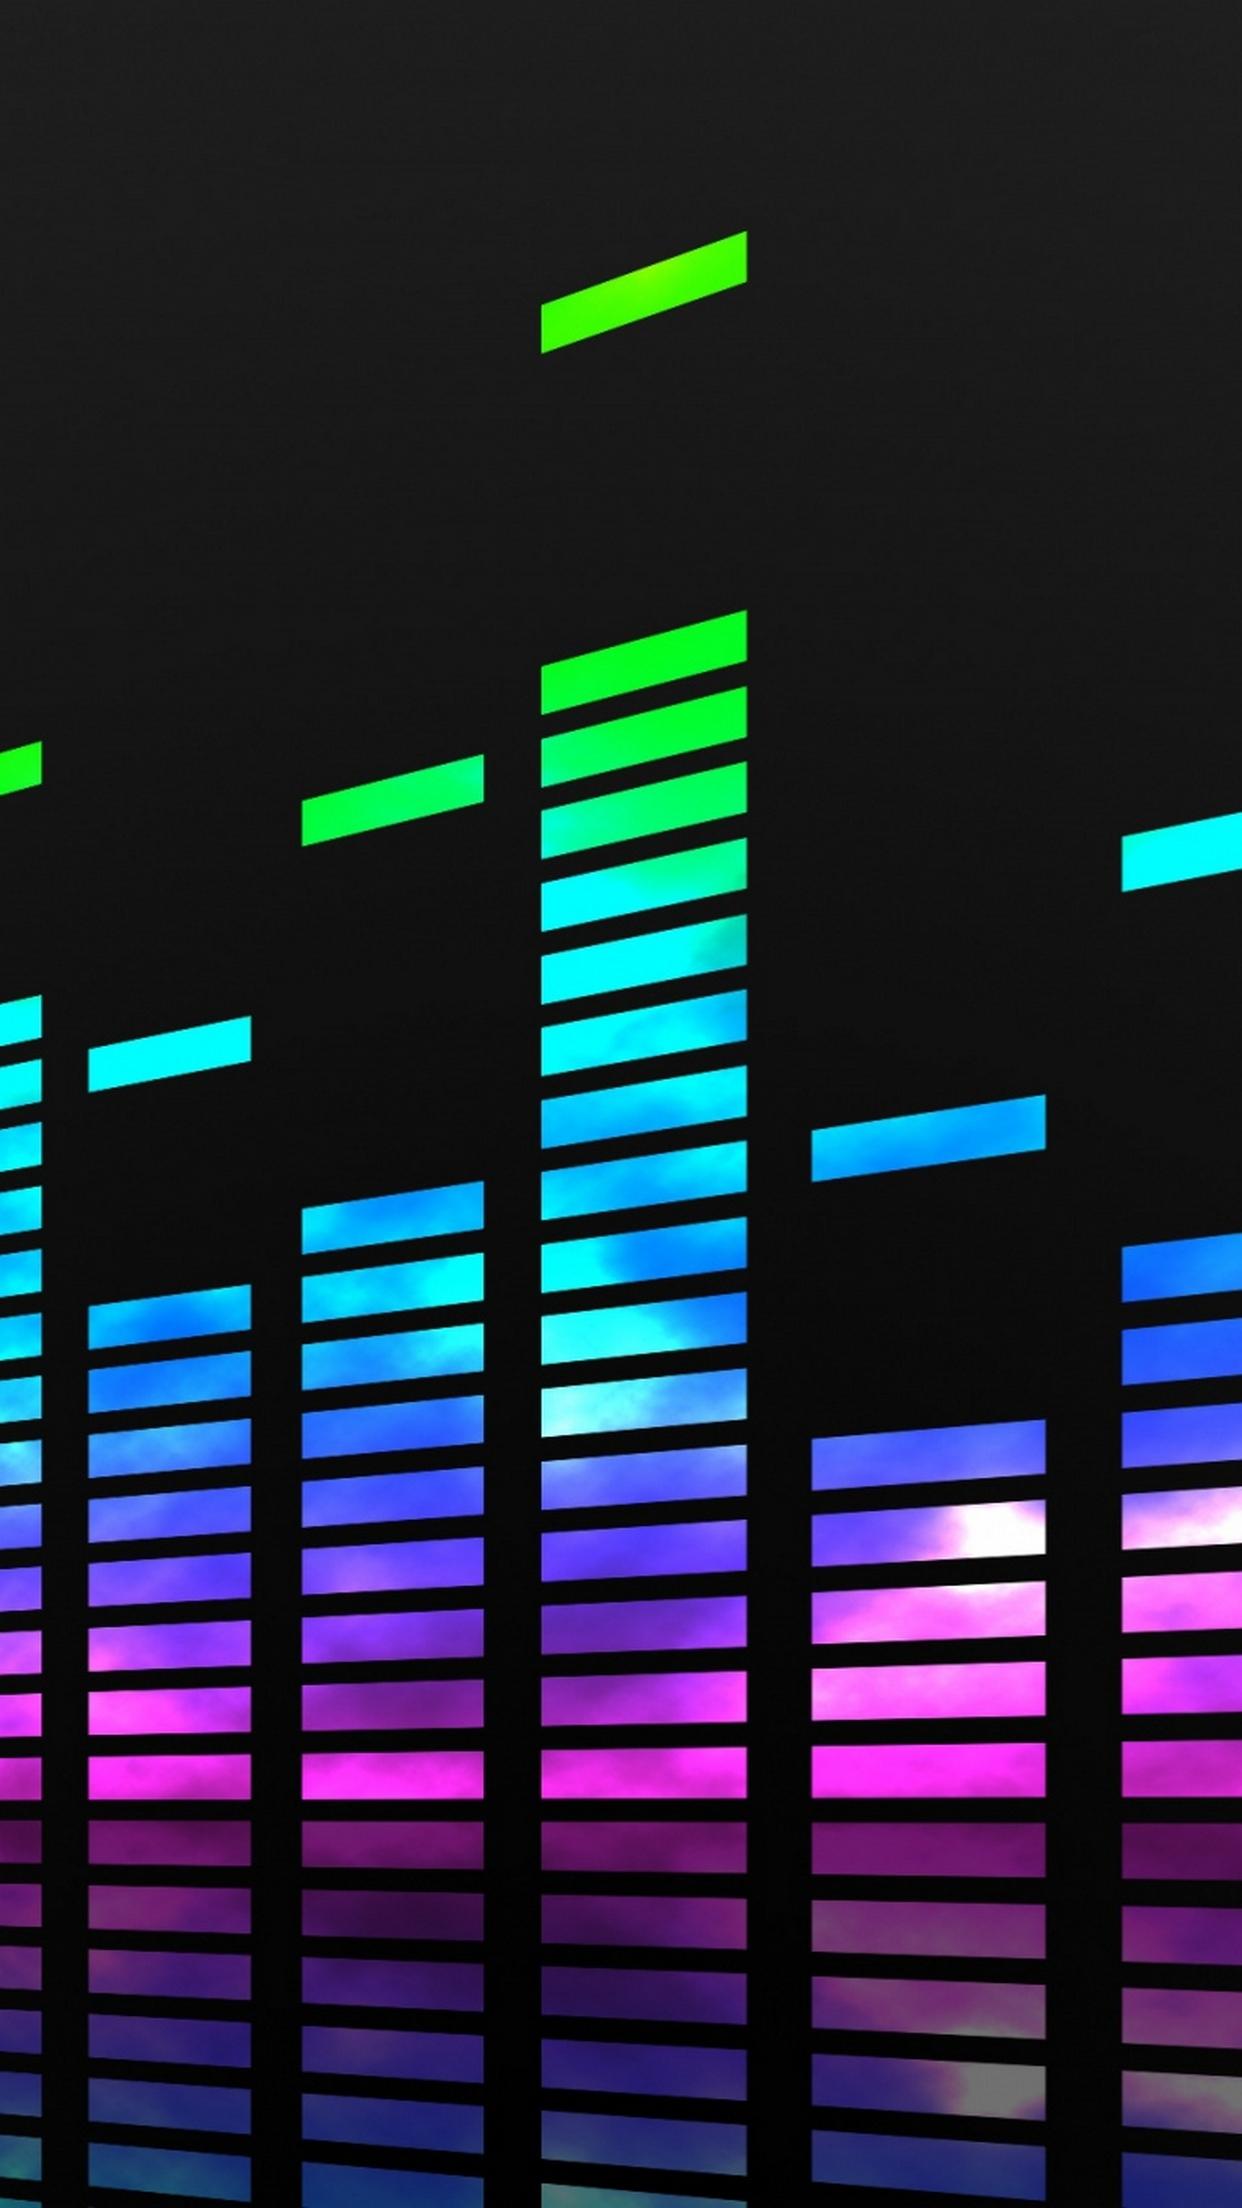 Music Equalizer Hd Rainbows